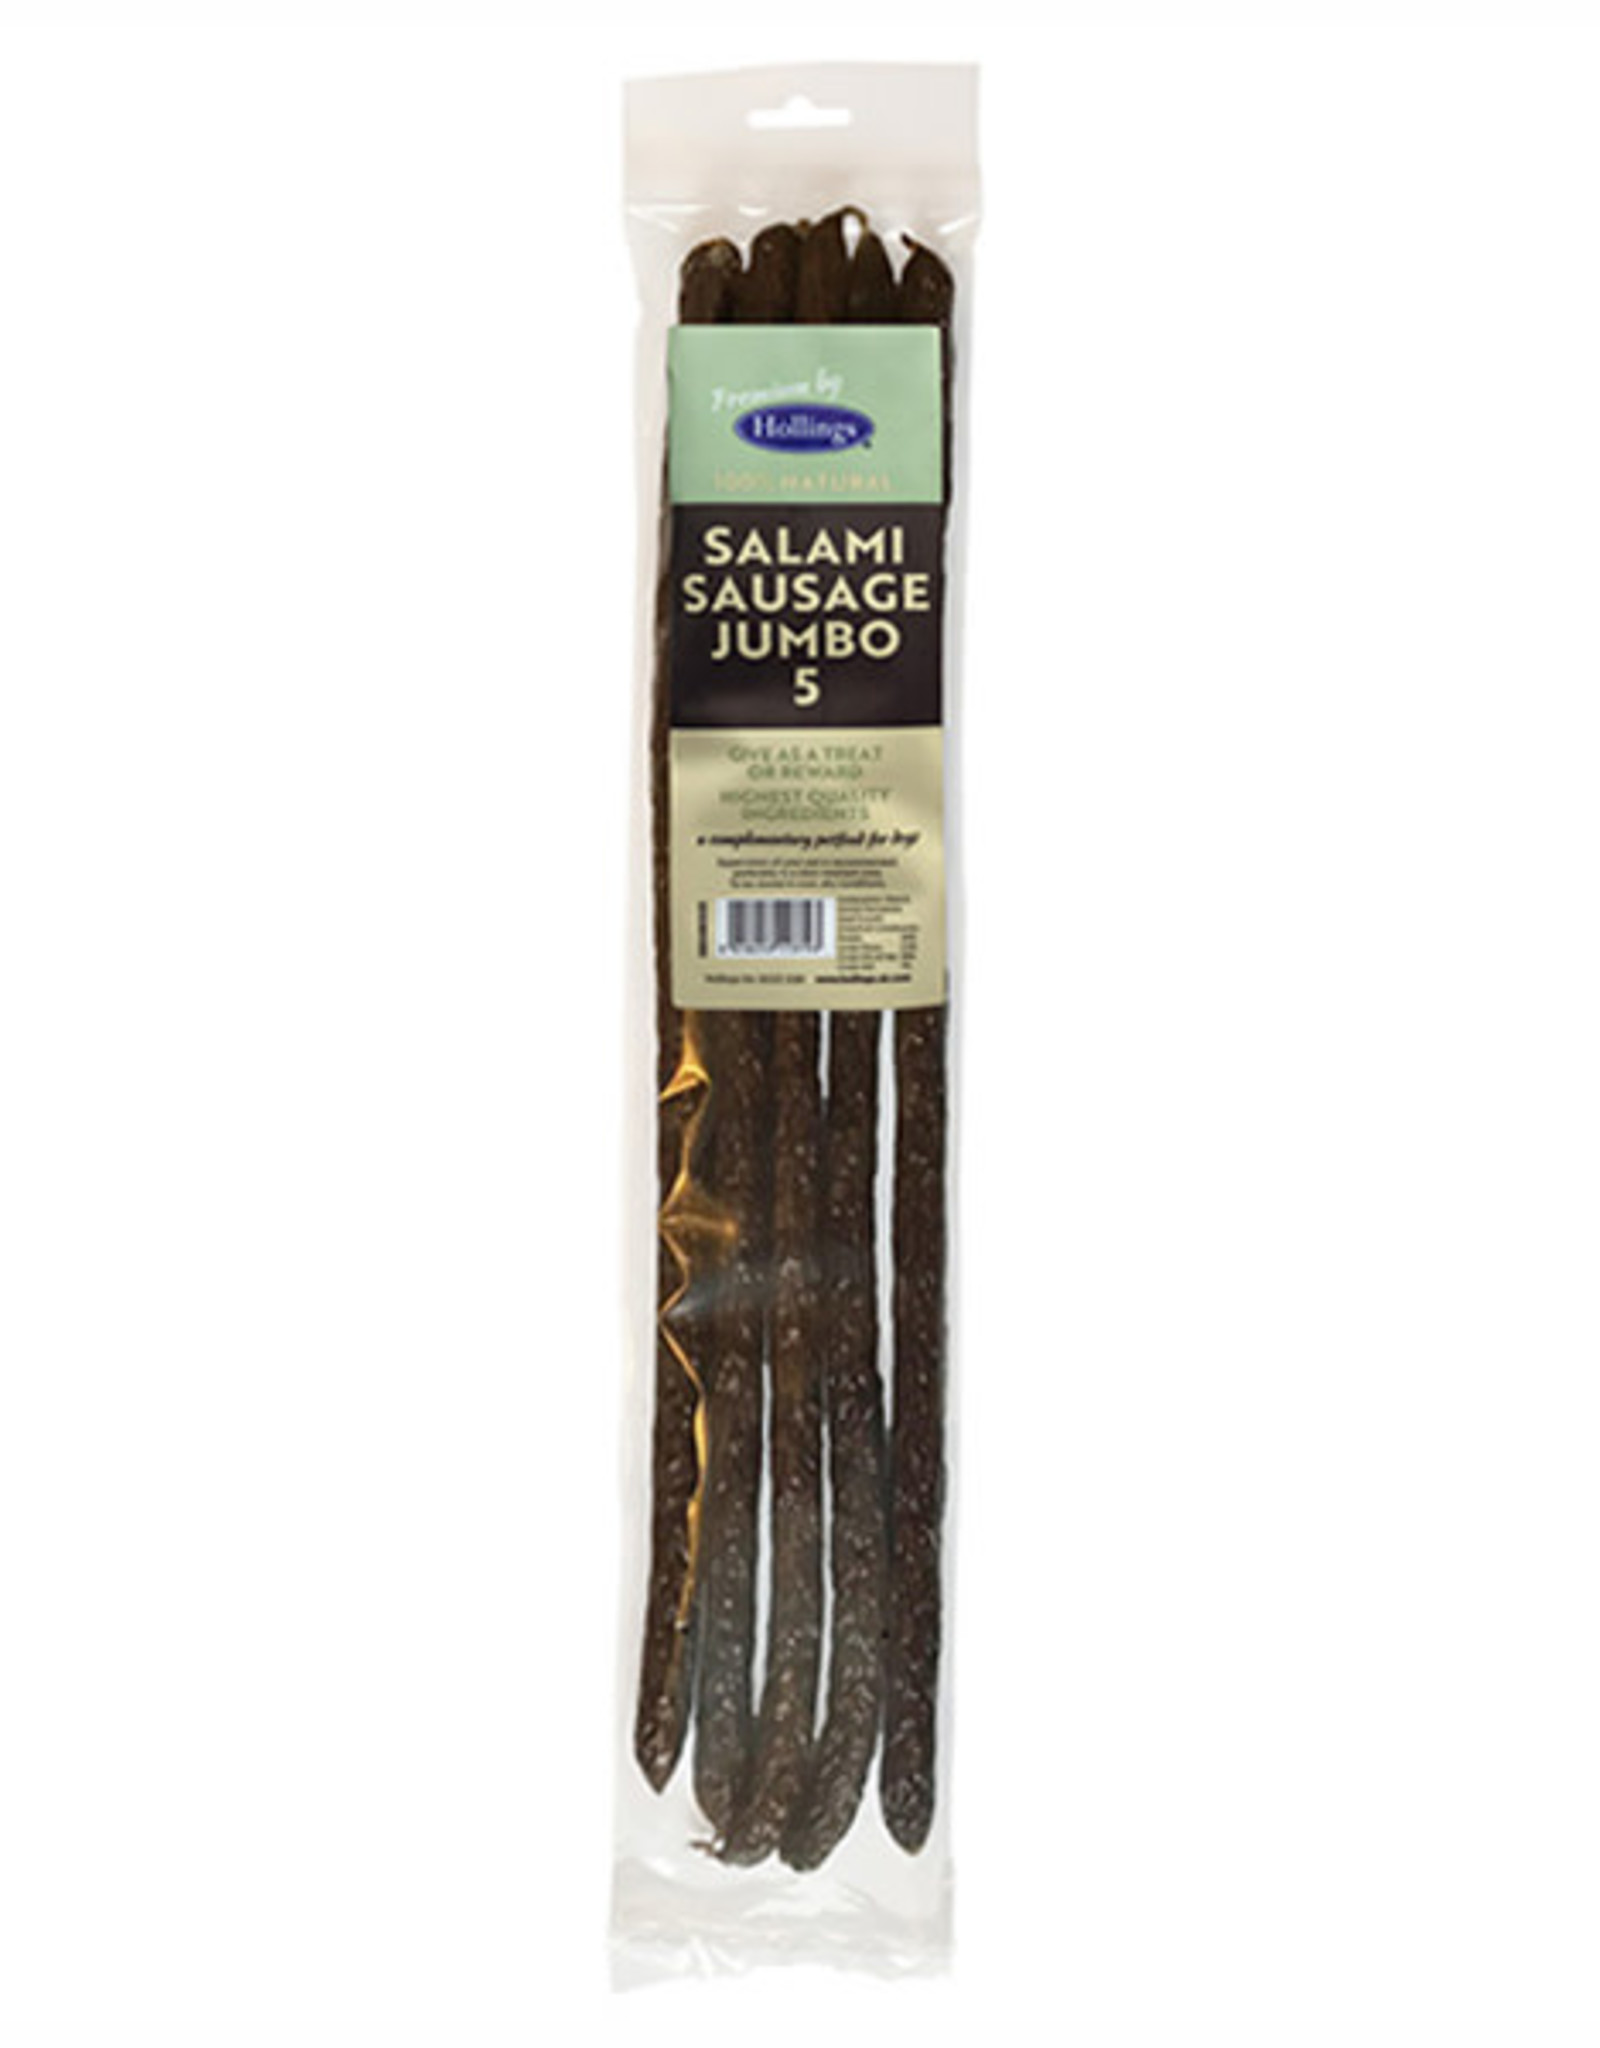 Hollings Jumbo Salami Sausage Dog Treats, 5 pack